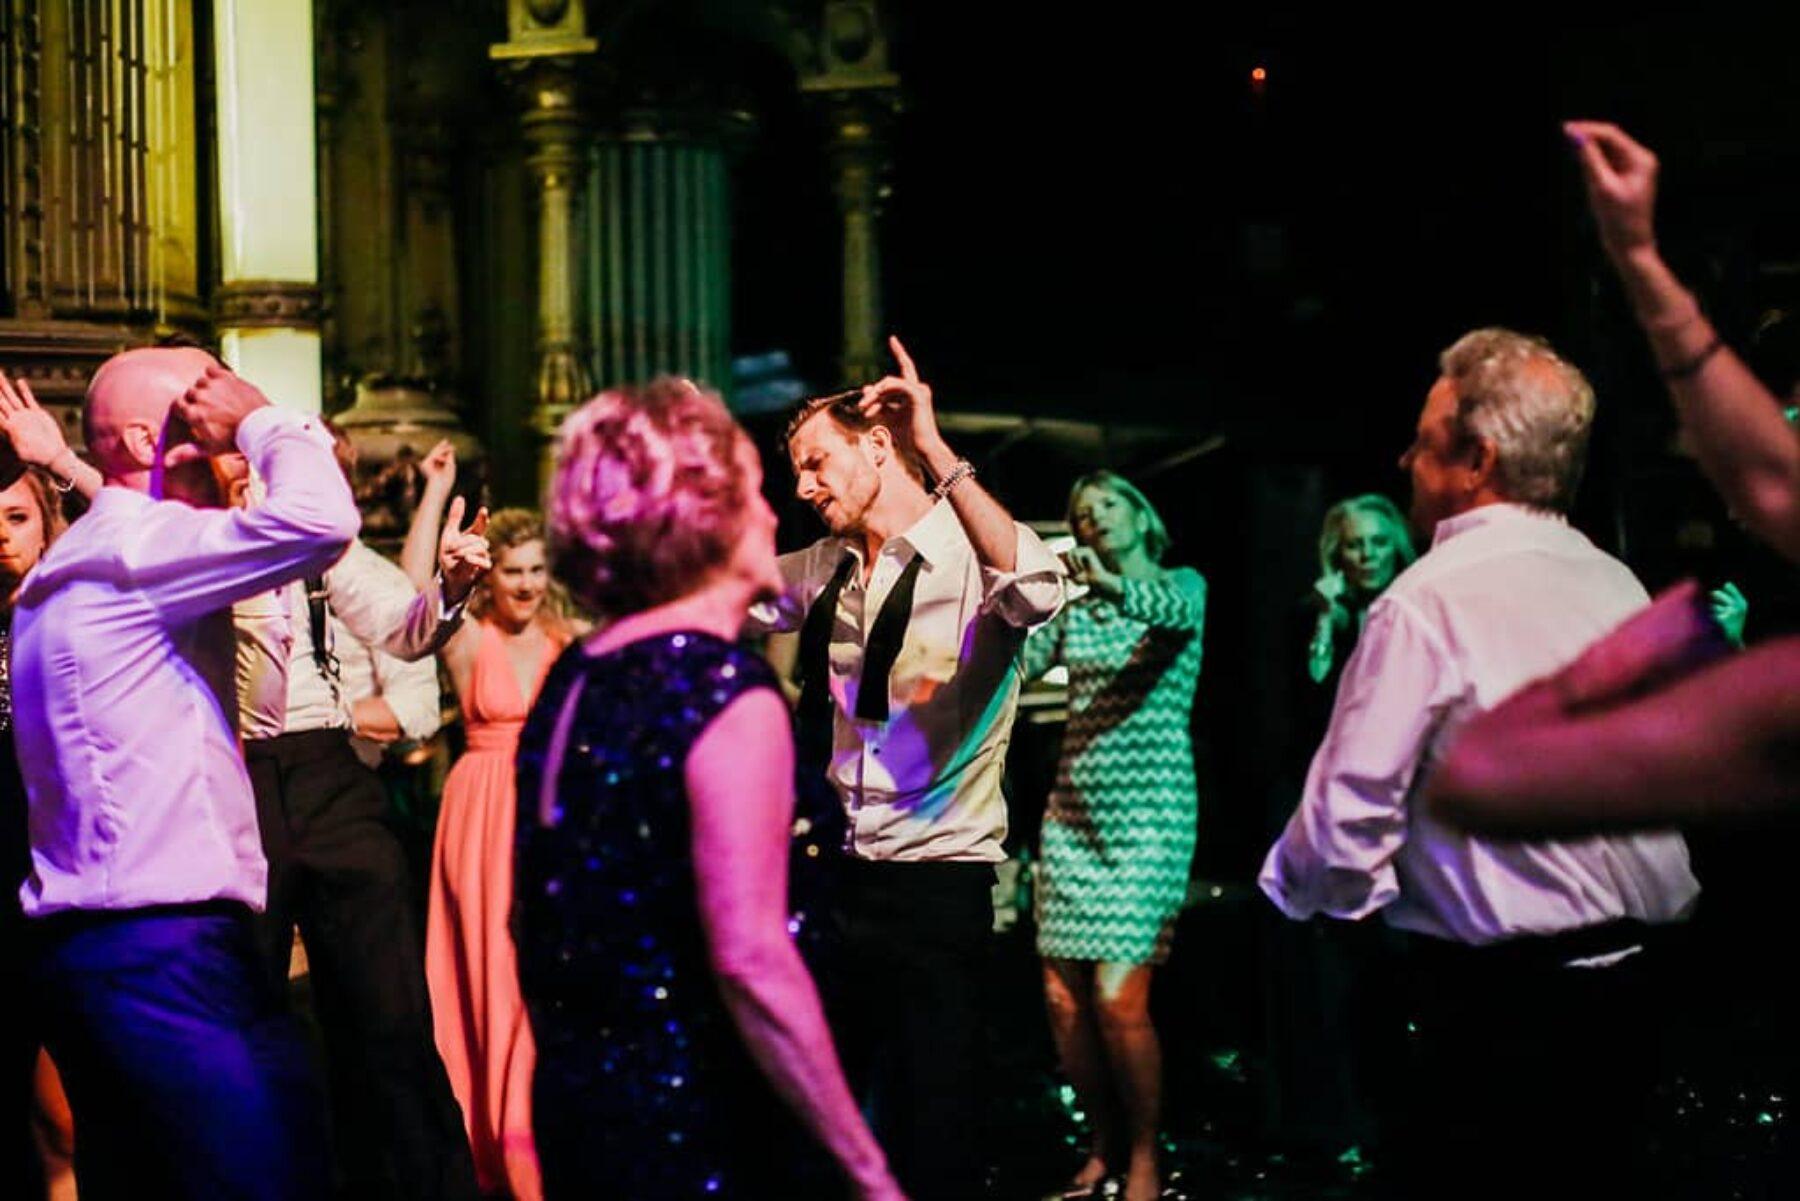 Epic Sydney wedding at Fairground Follies - photography by Lara Hotz